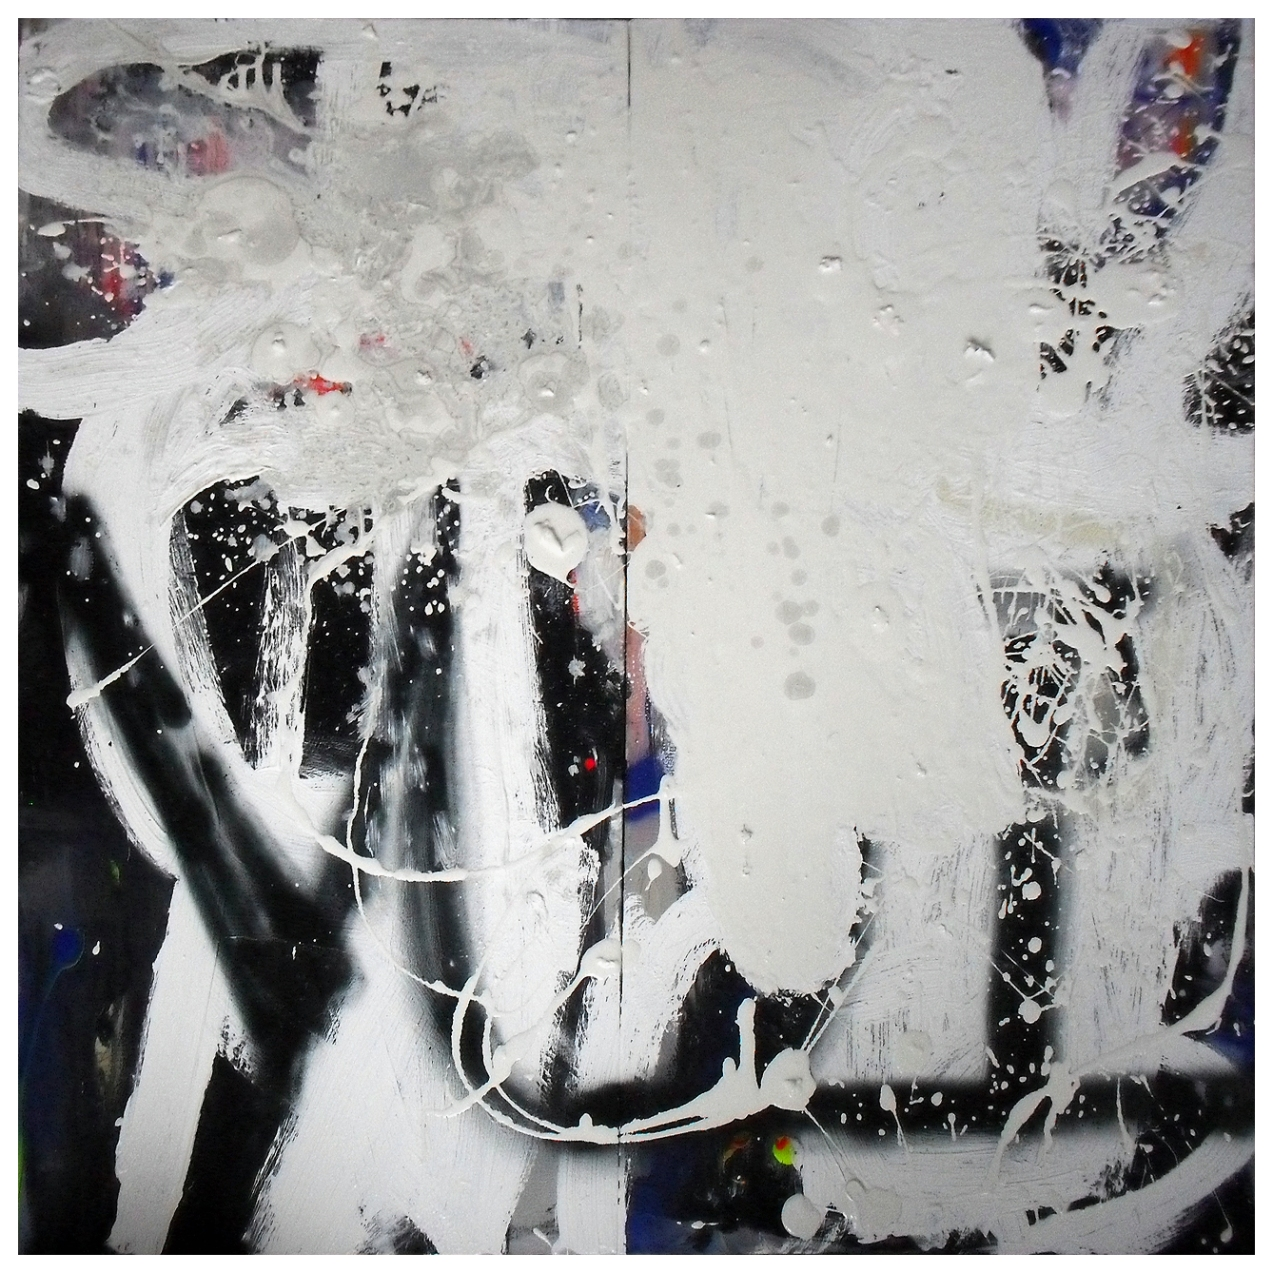 Untitled, Oil, oil stick & spray paint on linen, 2 panels, 101 x 154 cm, EC 2013